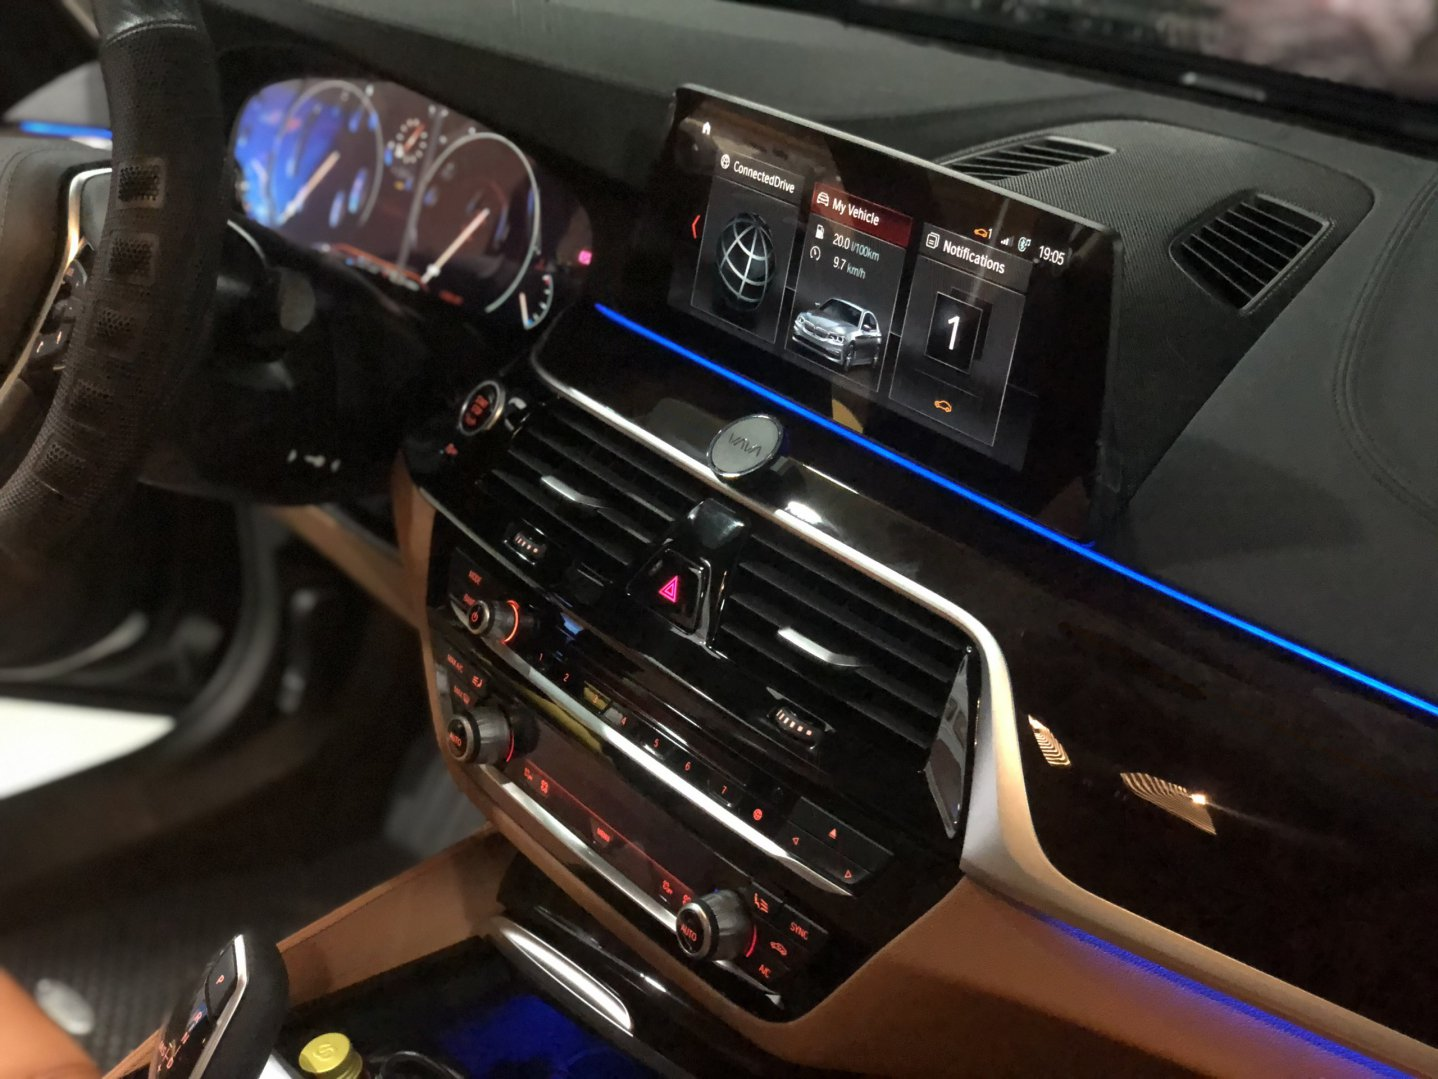 Thảm lót sàn KATA BMW 530i 2020